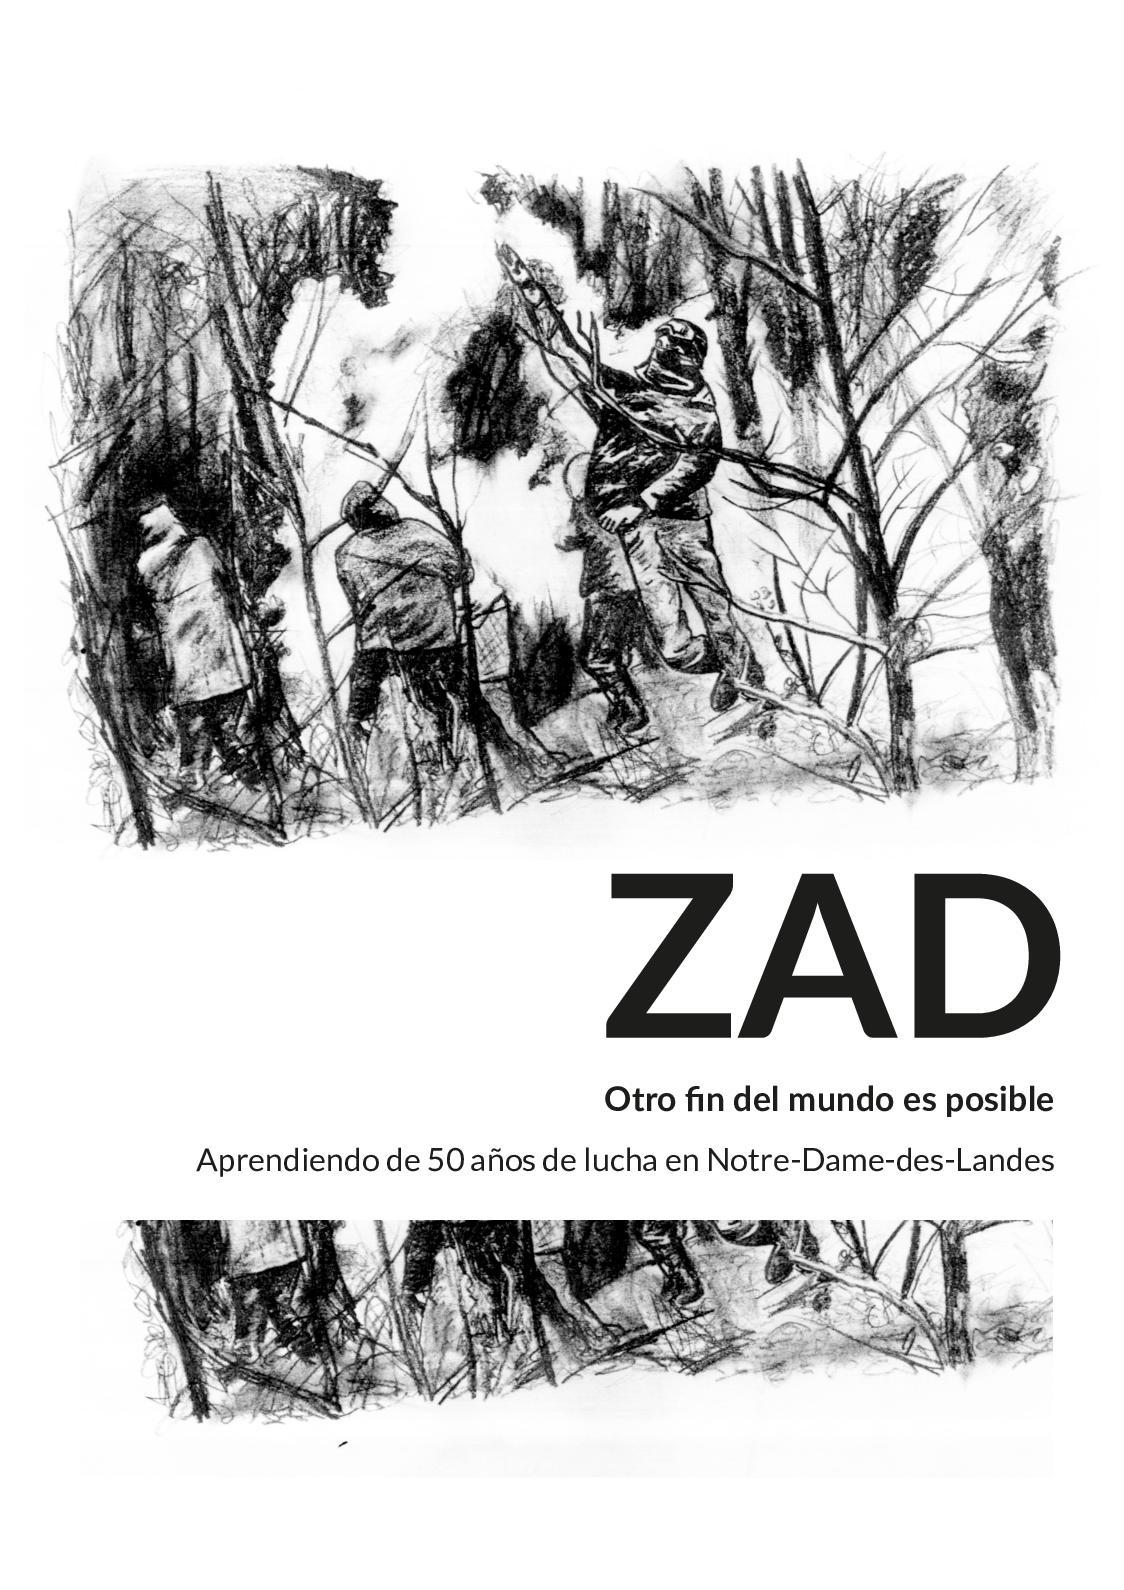 Calaméo - Zadotrofindelmundo